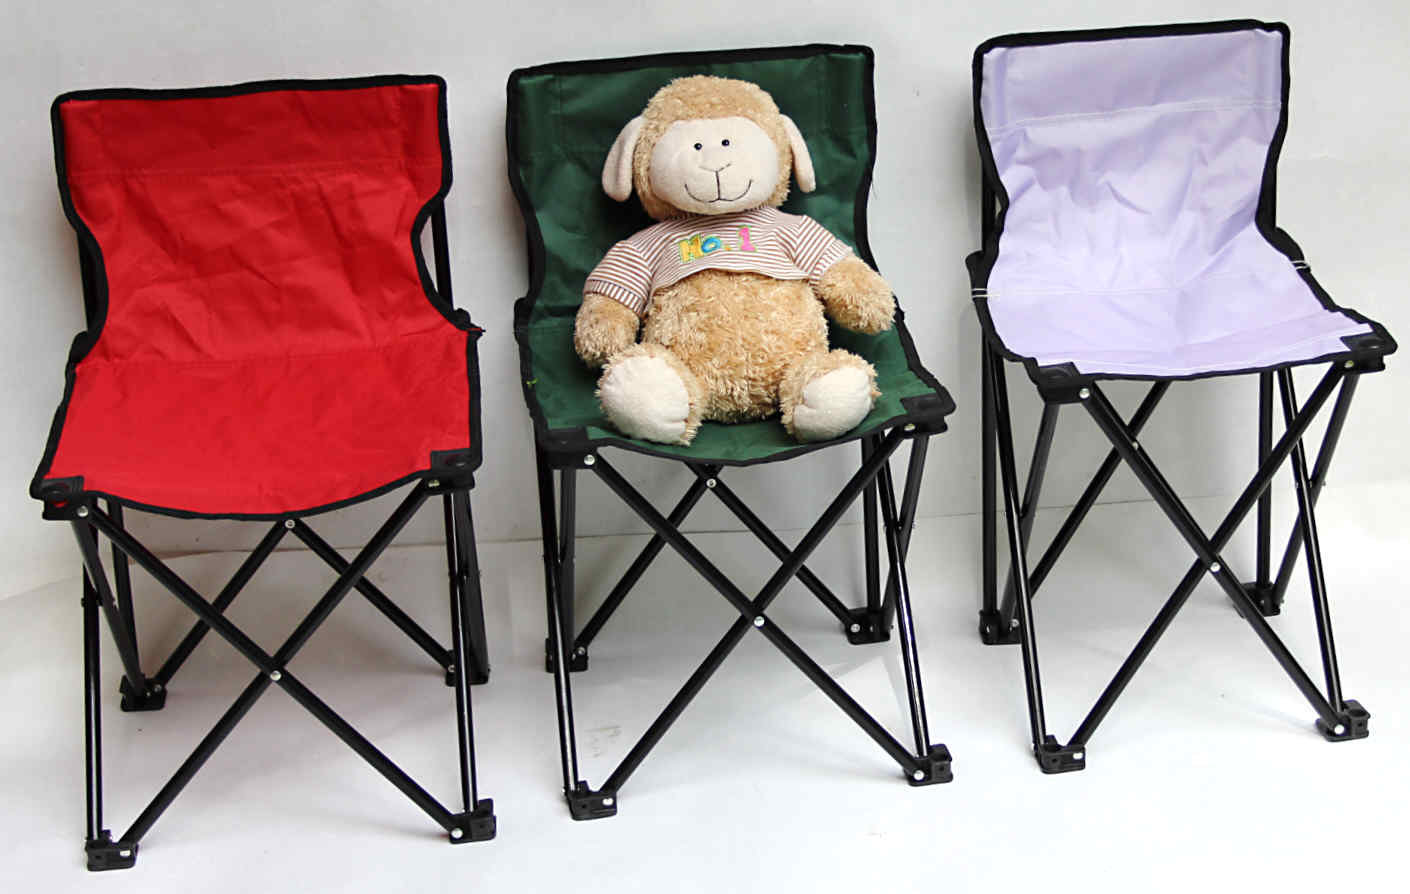 Camping Stuhl Aluminium Campingstuhl Kinder Klappstuhl Kinderstuhl Faltstuhl